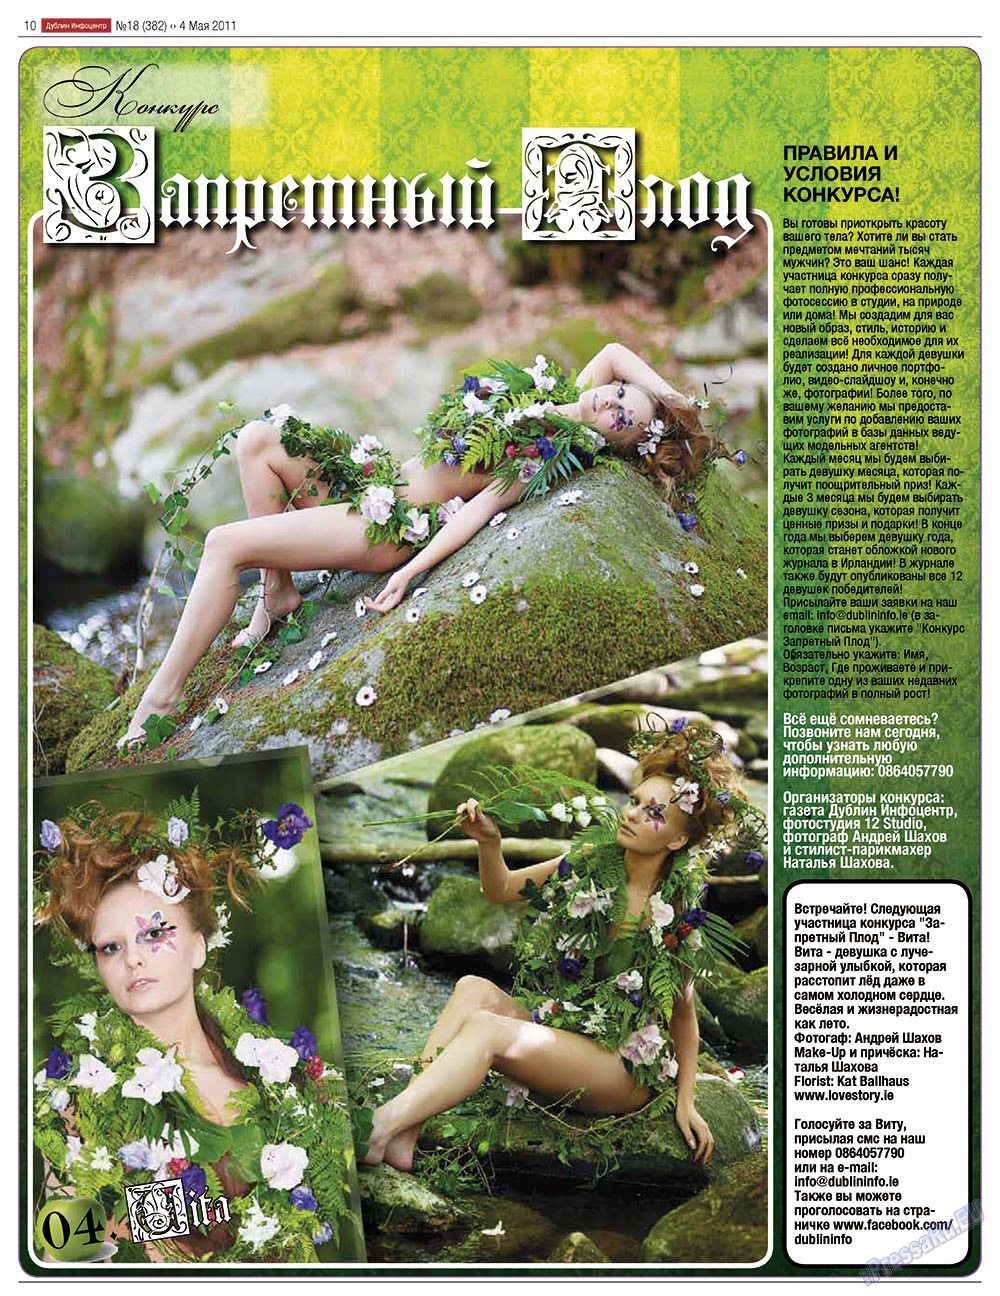 Дублин инфоцентр (газета). 2011 год, номер 18, стр. 10